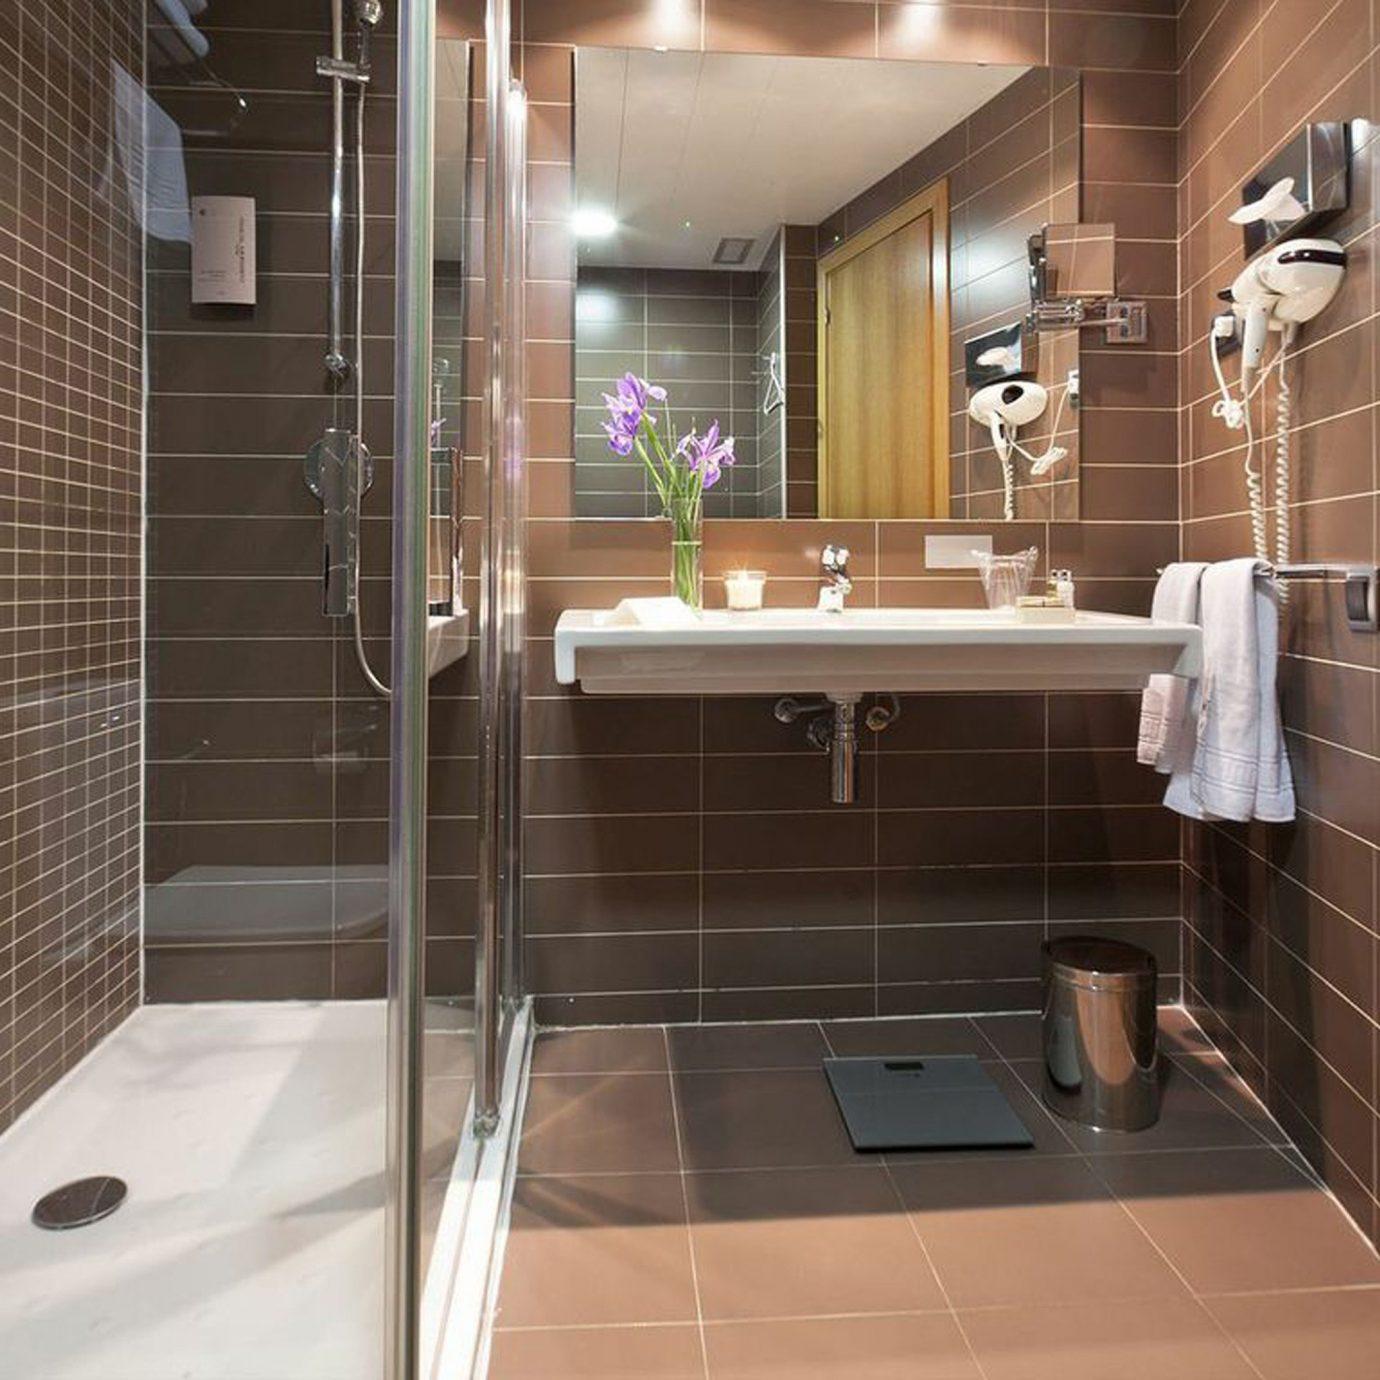 Bath Hip Luxury bathroom toilet shower property tiled tile sink plumbing fixture flooring home swimming pool stall tub